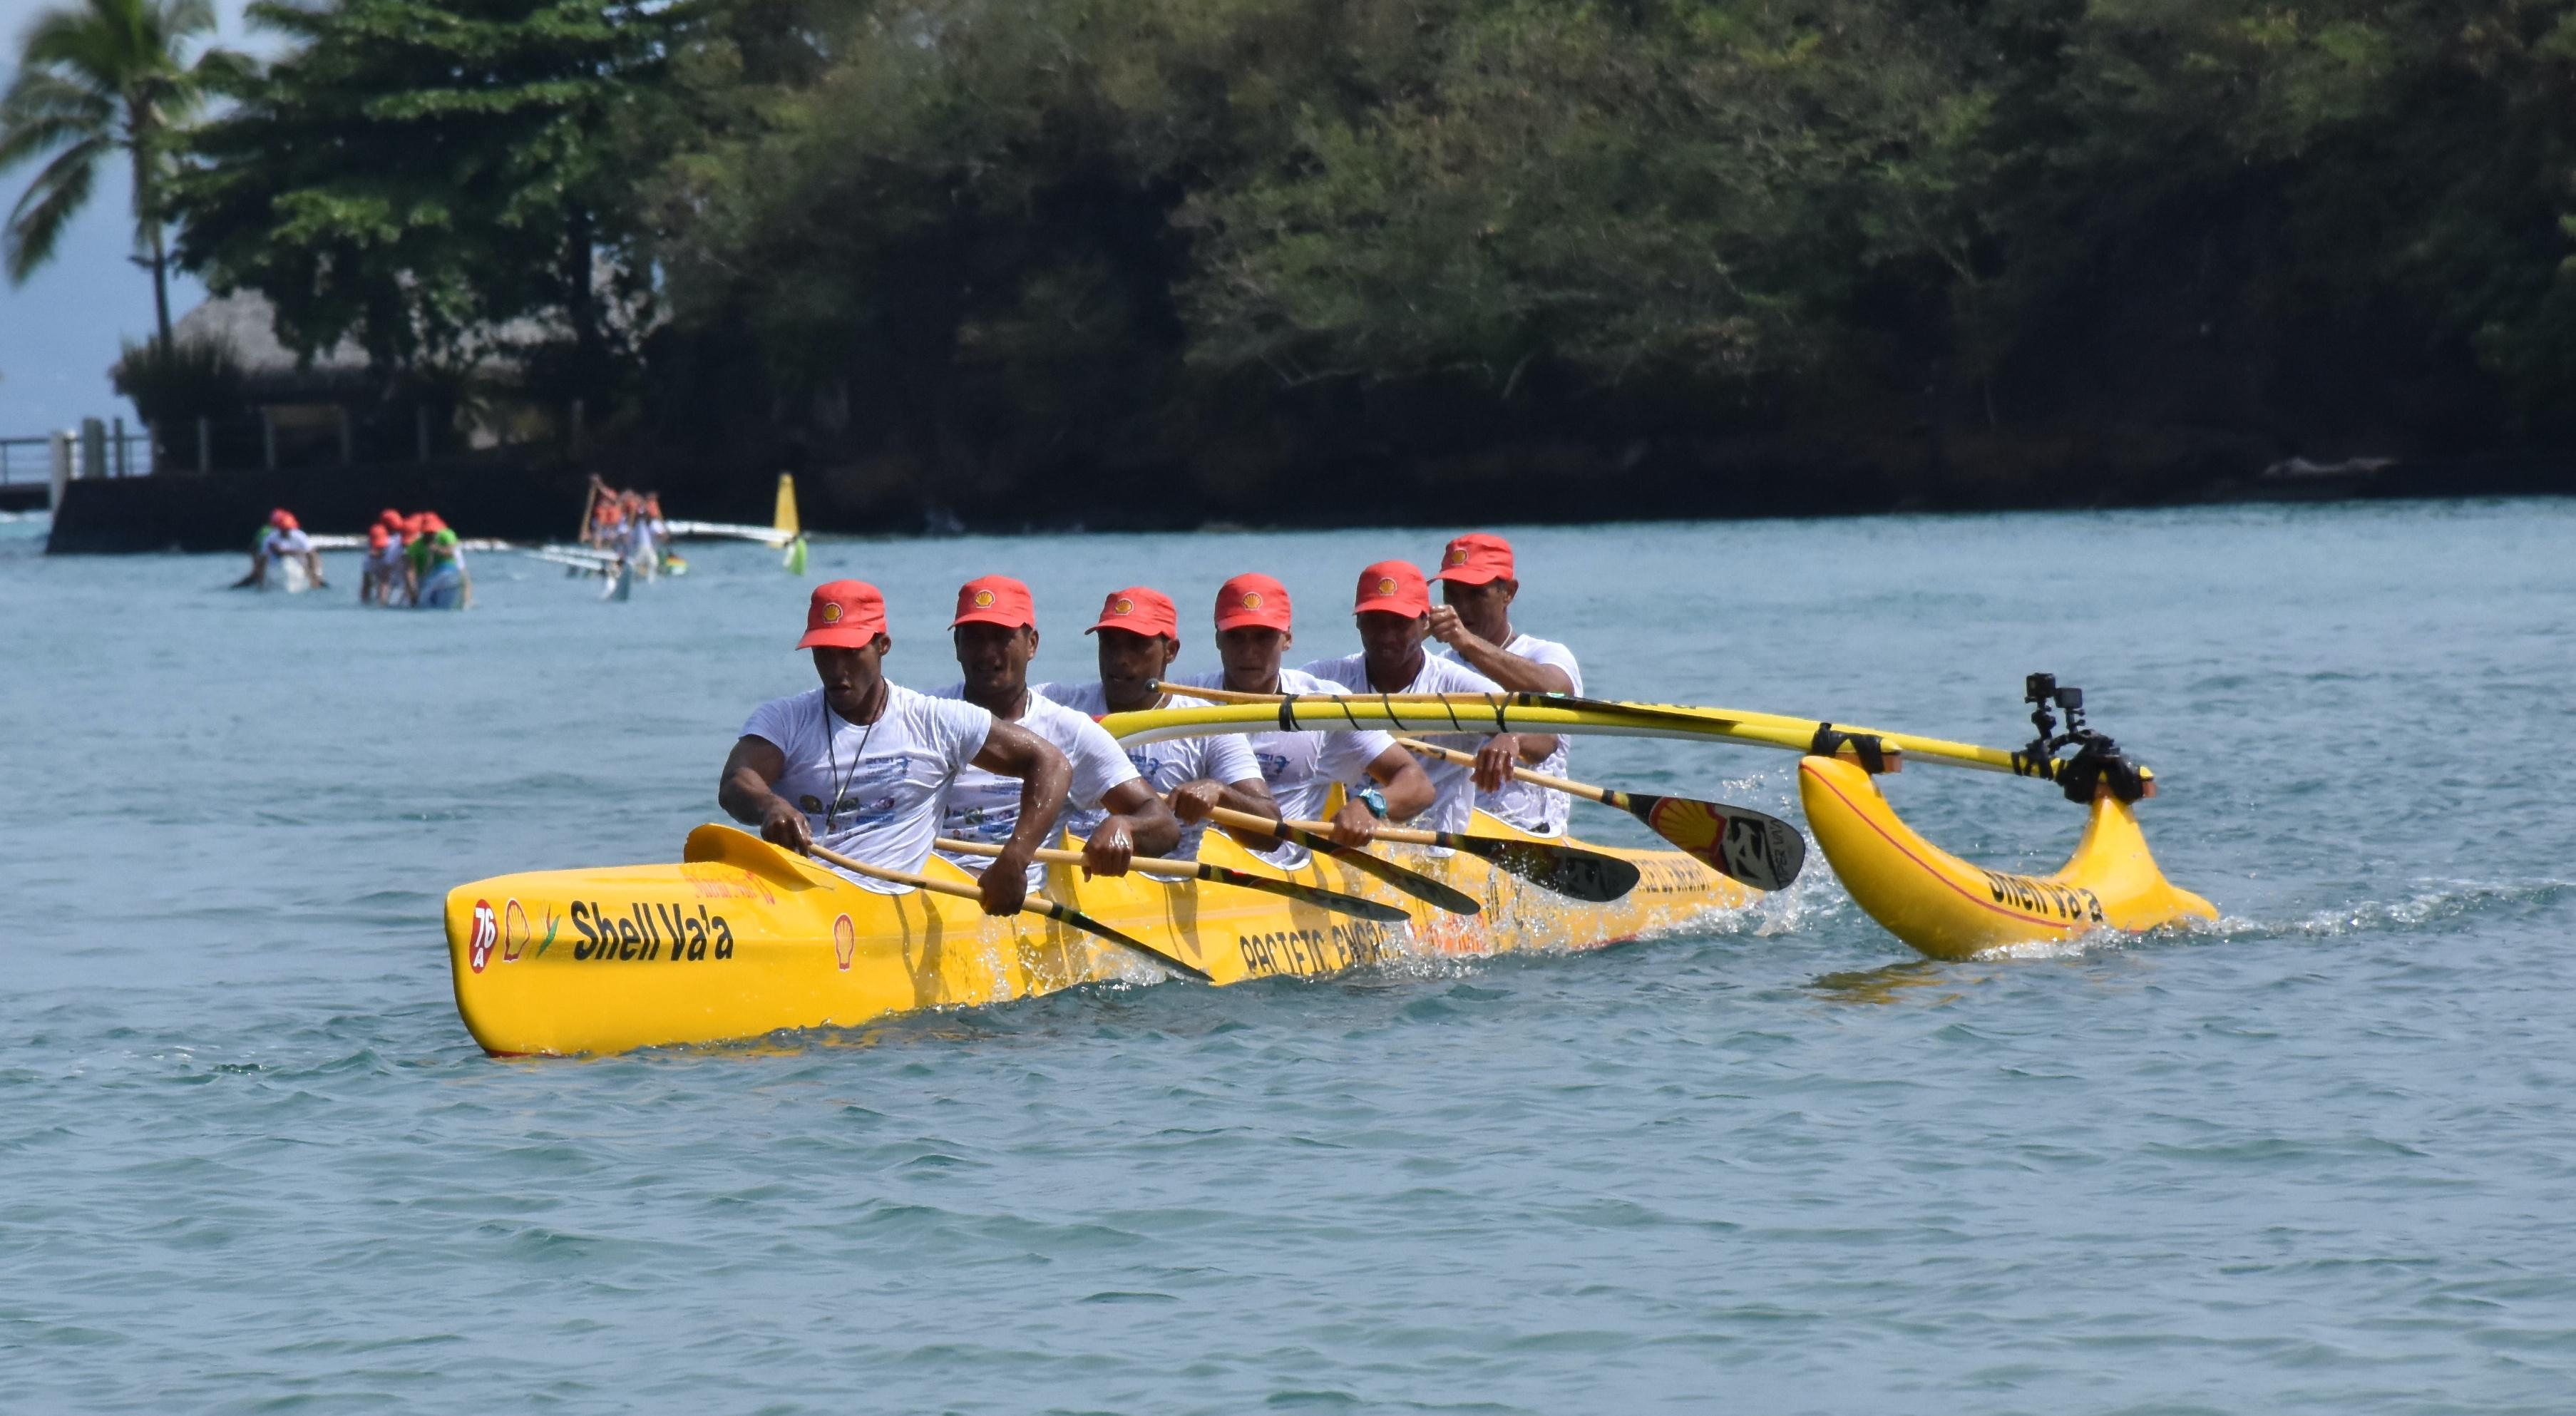 L'équipage A de Shell Va'a avec Erimereta Tautu, Charles Teinauri, Taaroa Dubois, Narai Atger, Brice Punuataahitua et David Tepava.